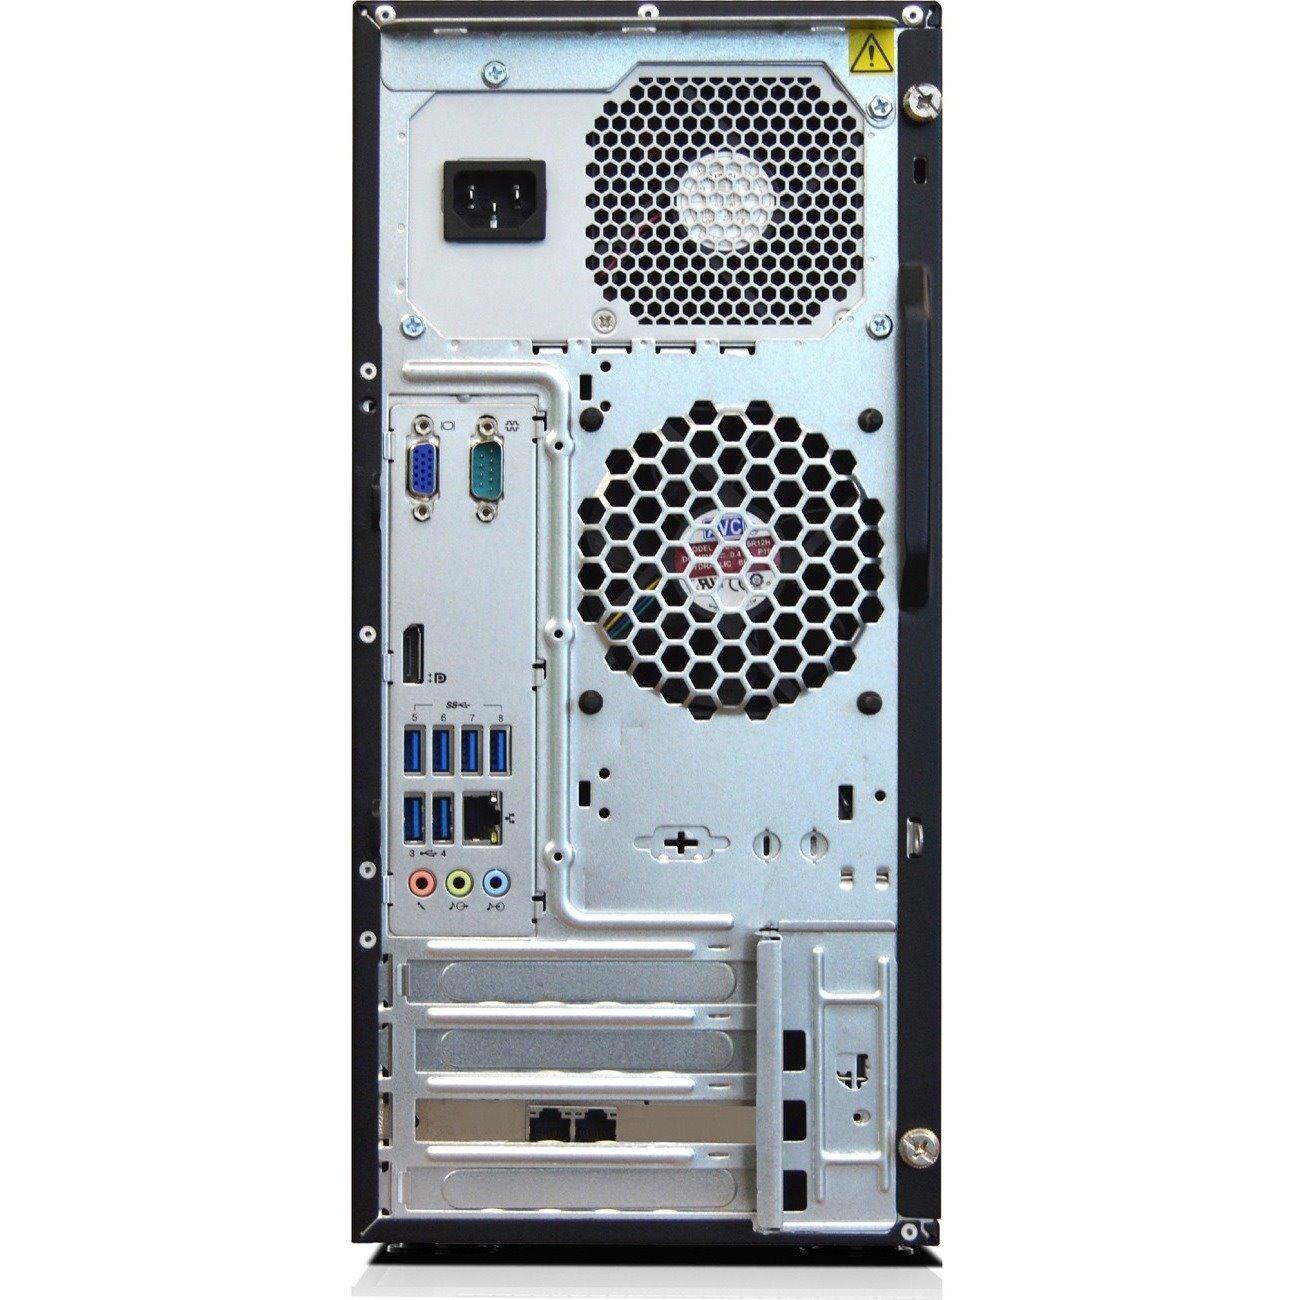 Lenovo ThinkServer TS150 70UB000UAZ 4U Tower Server - 1 x Intel Xeon E3-1245 v6 Quad-core (4 Core) 3.70 GHz - 8 GB Installed DDR4 SDRAM - Serial ATA/600 Controller - 0, 1, 5, 10 RAID Levels - 1 x 250 W